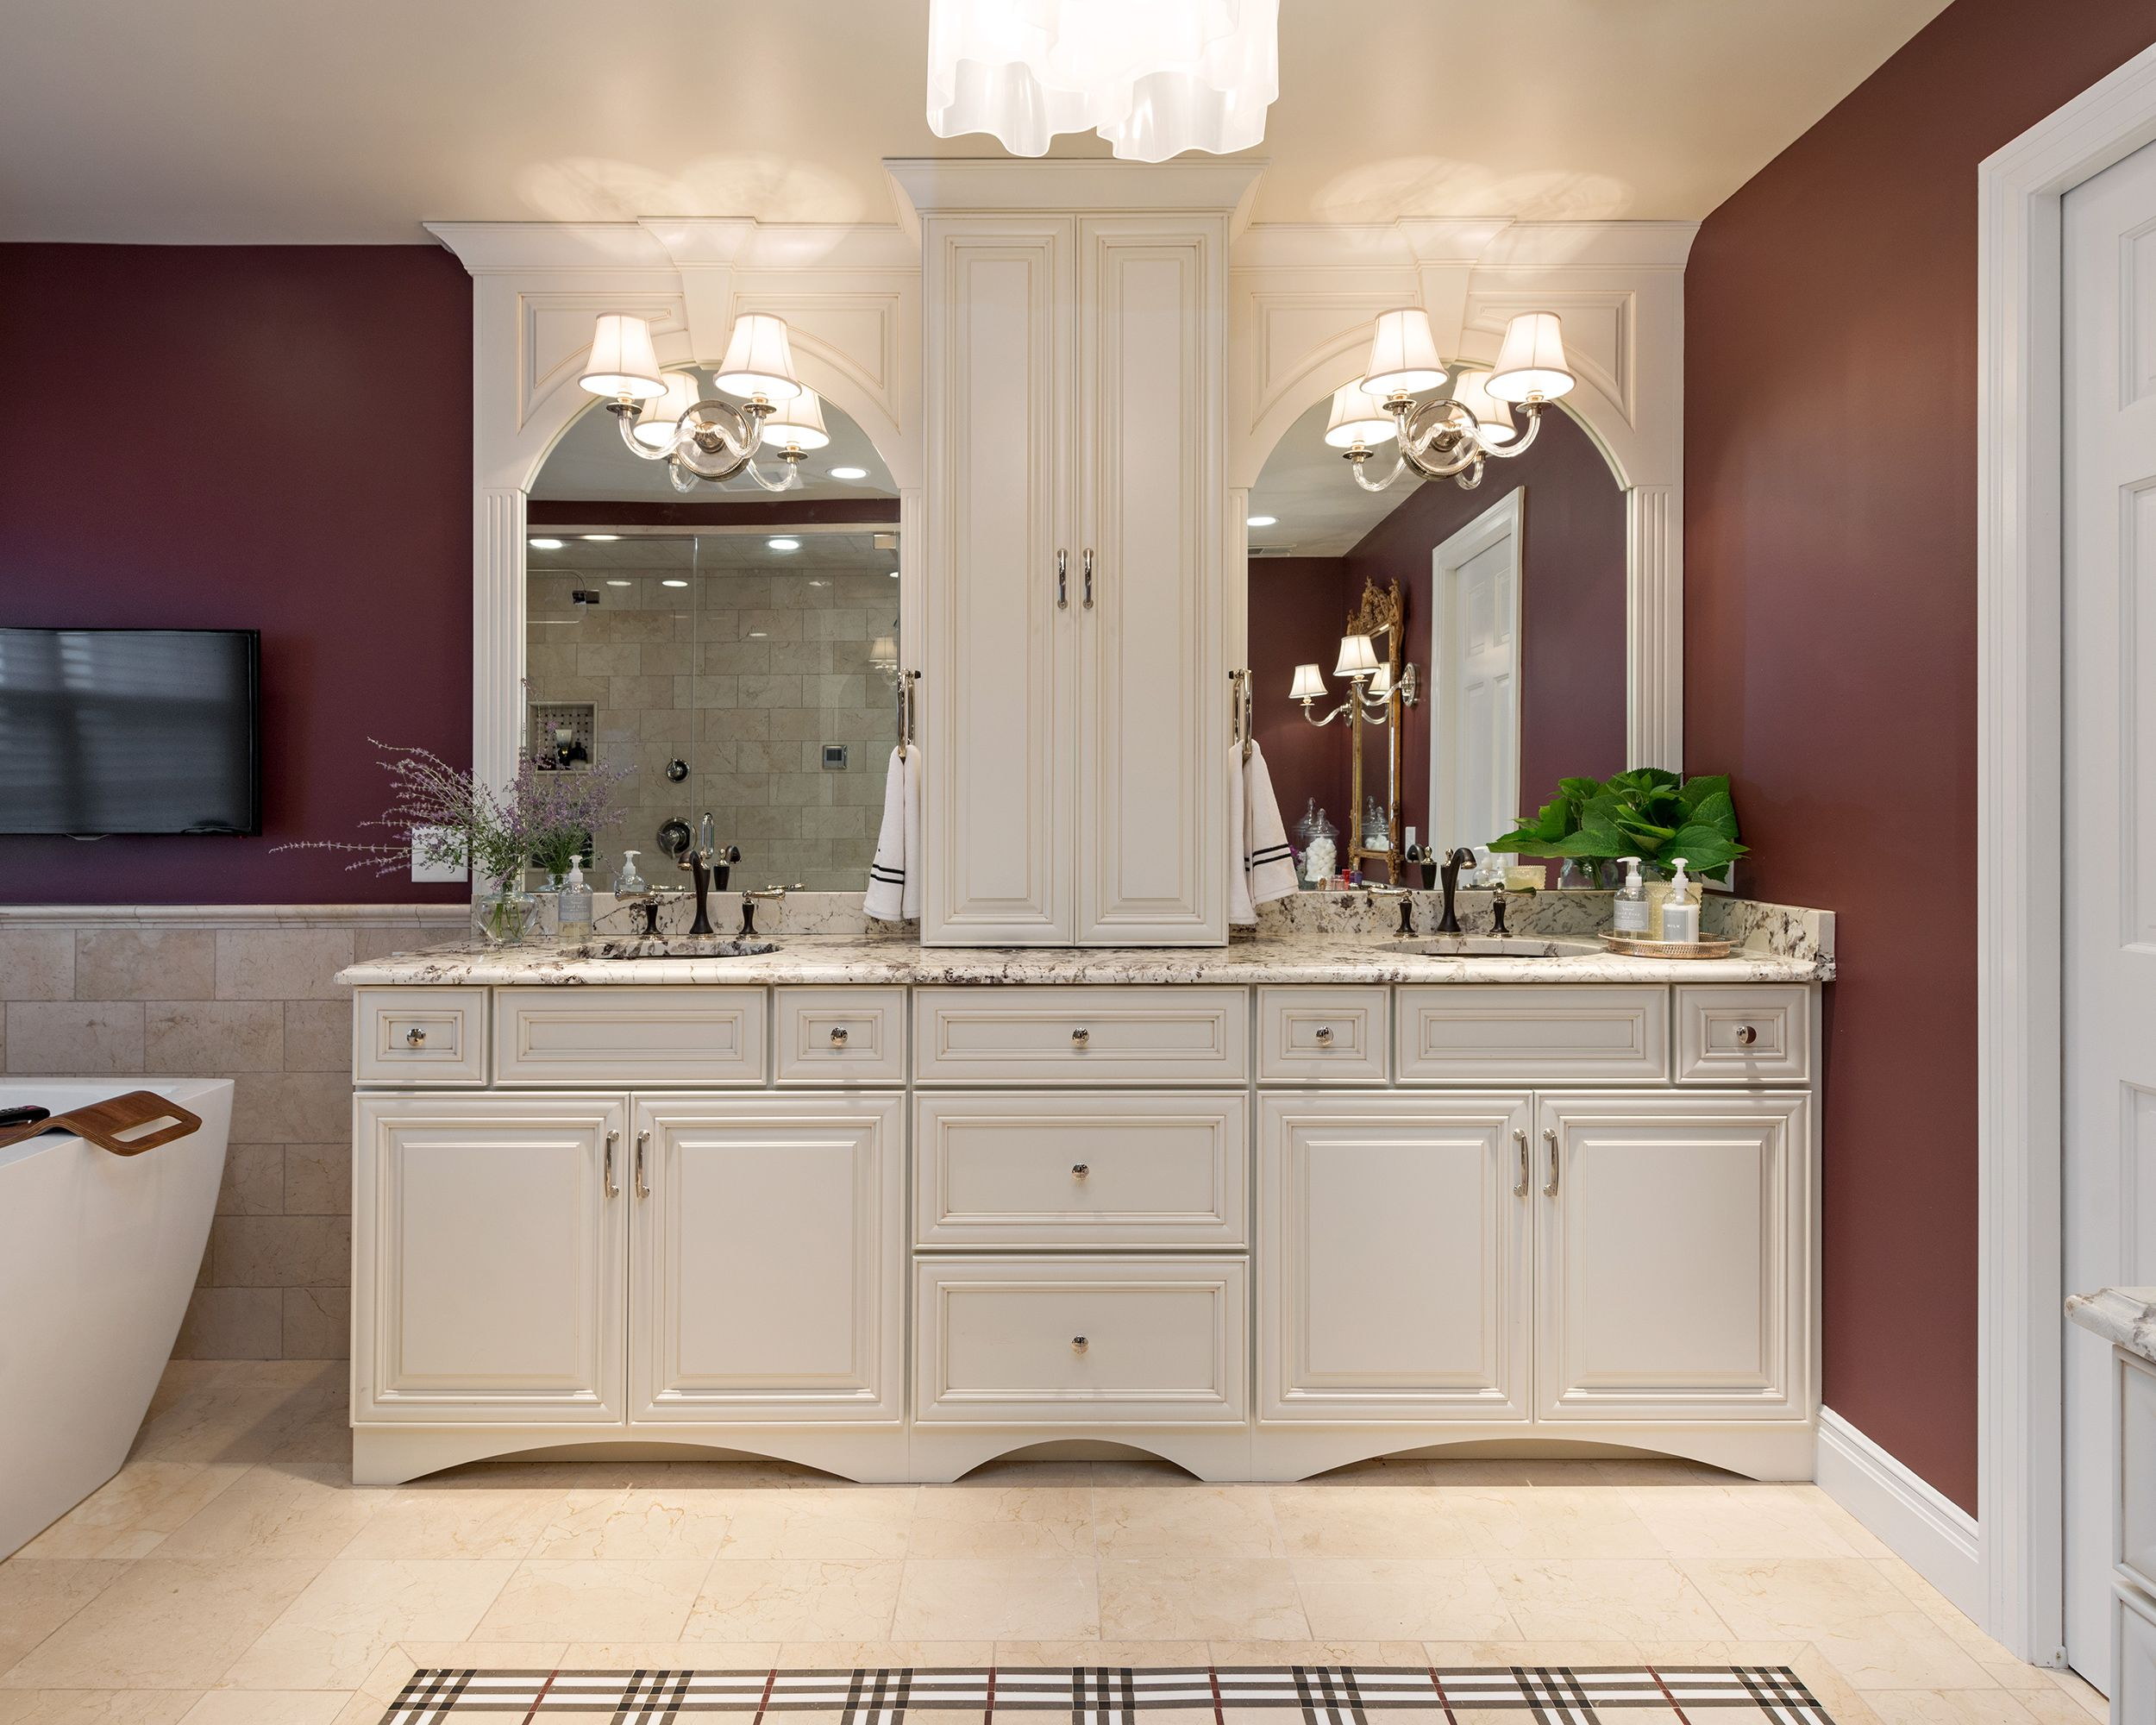 Webster Groves Master Bath DeSigNs By JoNi SpeAr Pinterest - Burgundy bathroom decor for small bathroom ideas